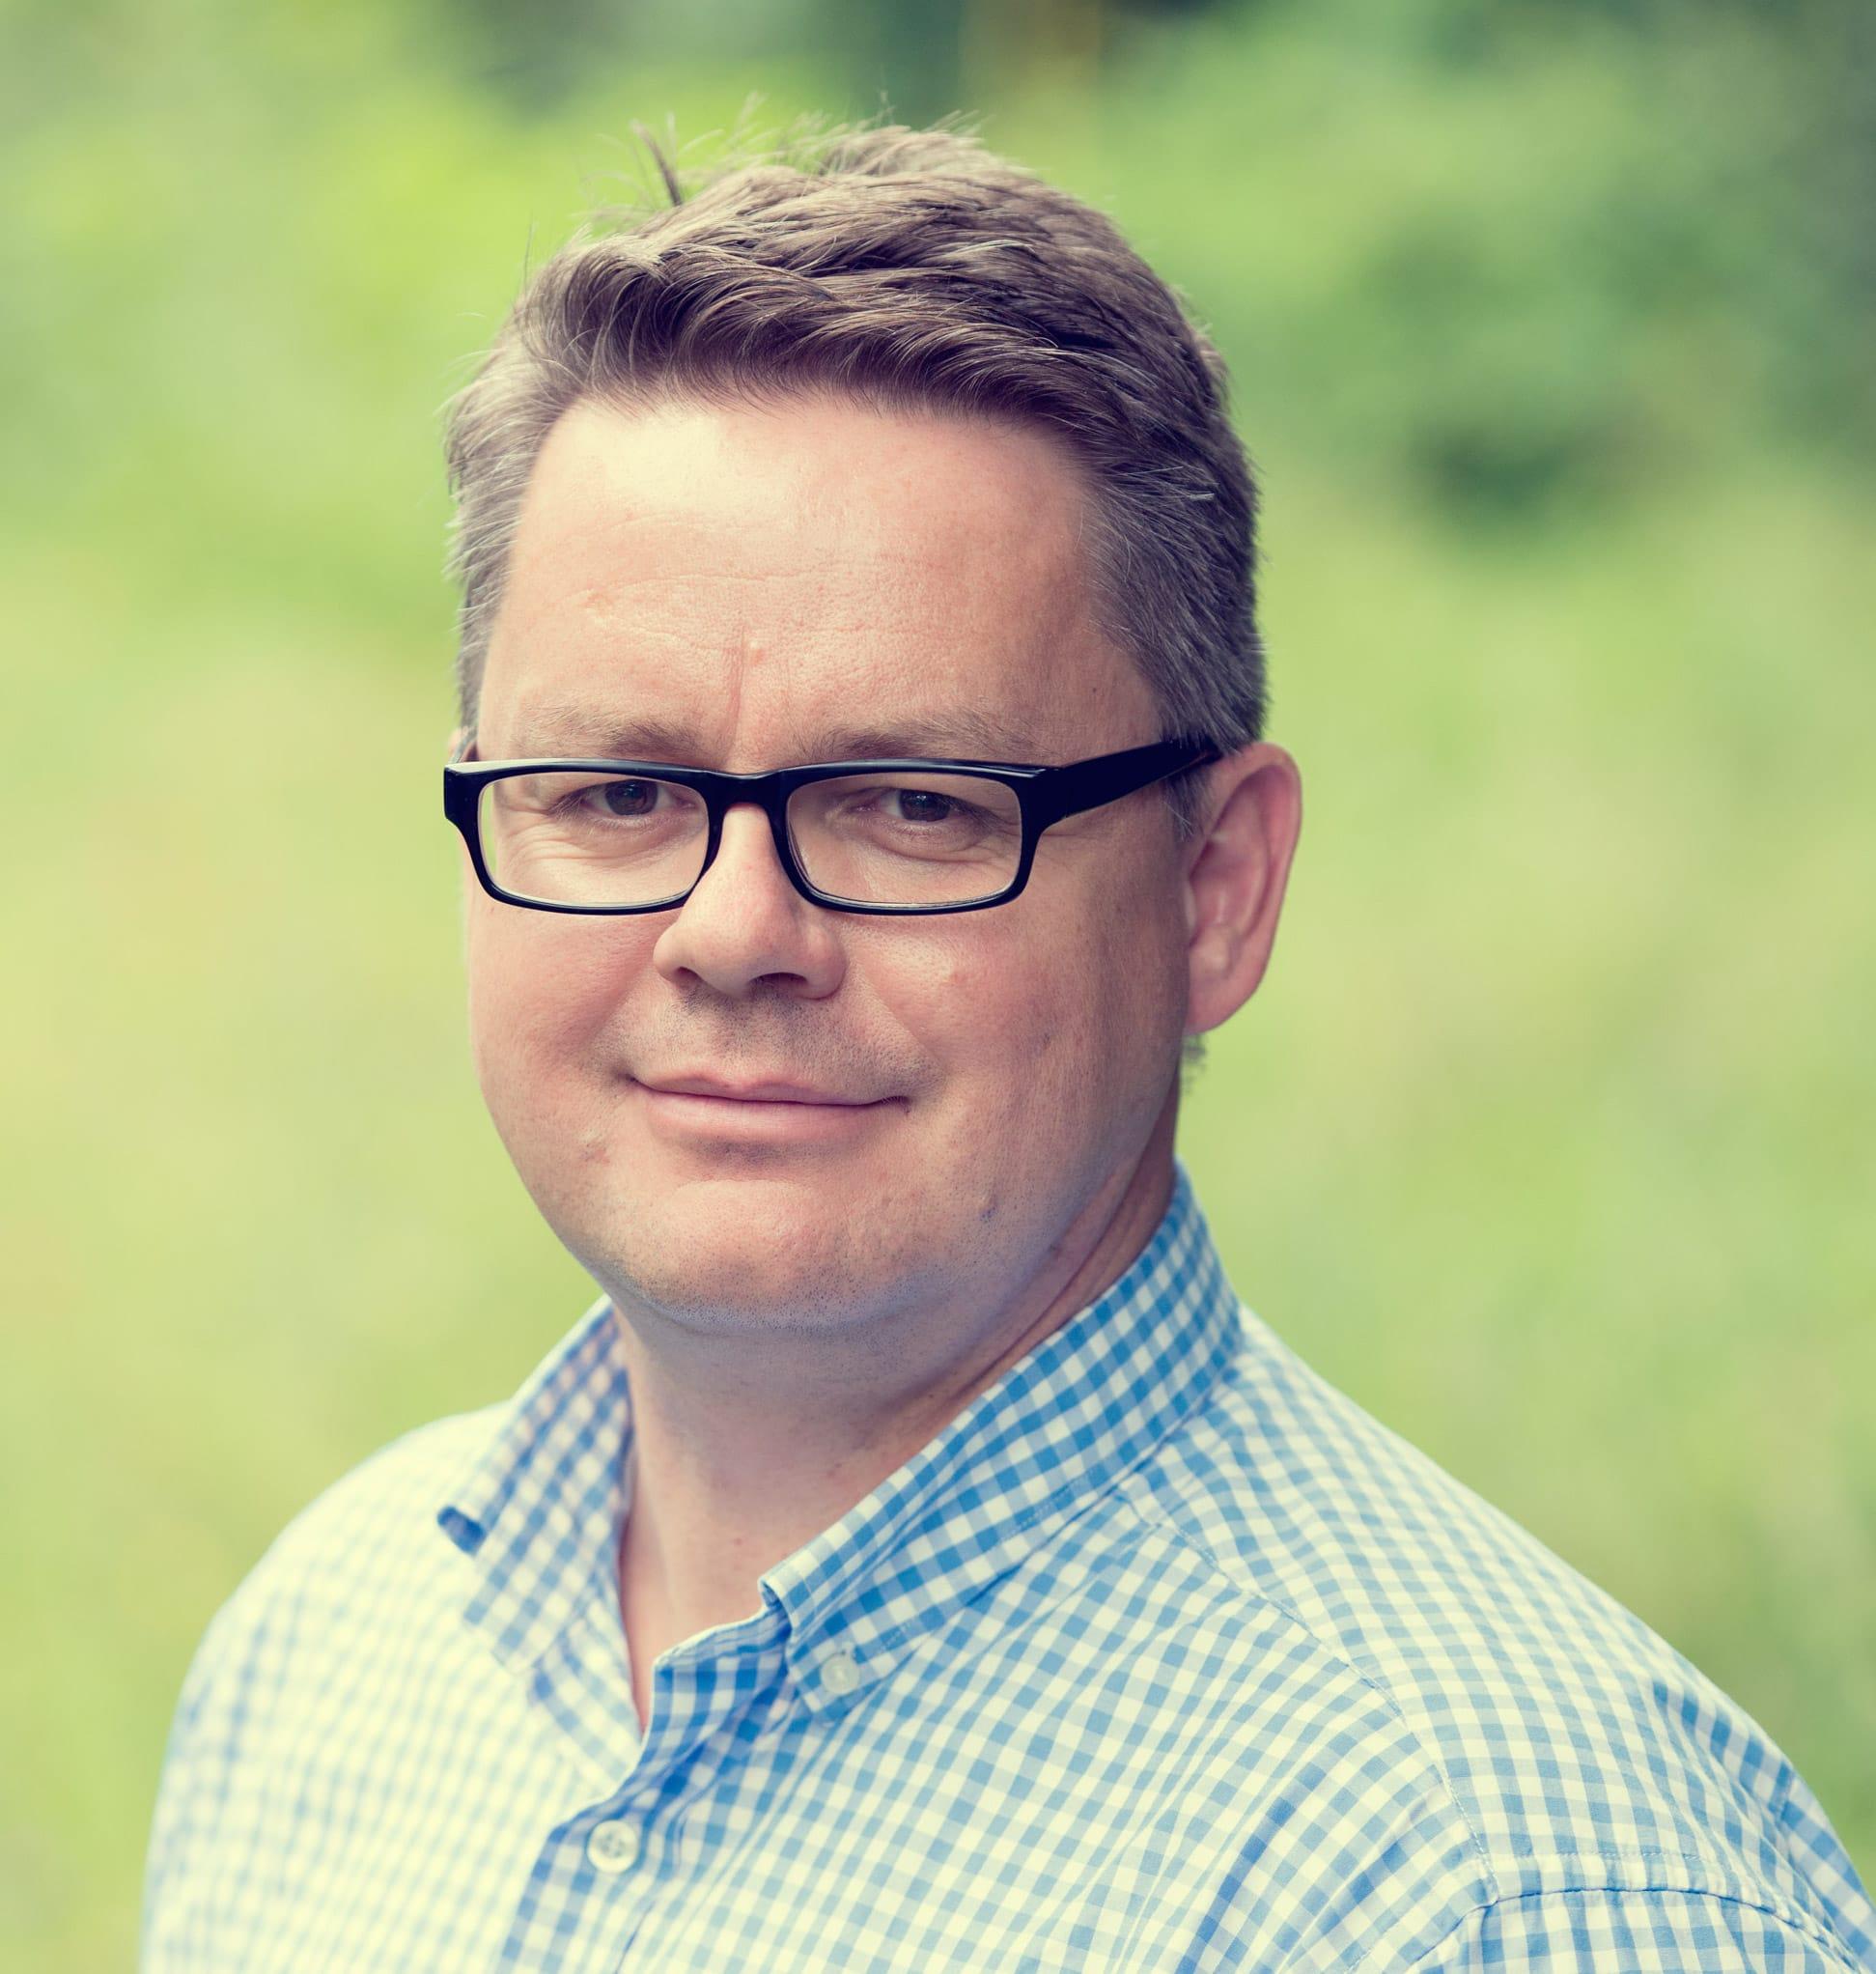 Interview with dotCMS Chief Sales Officer, Stefan Schinkel